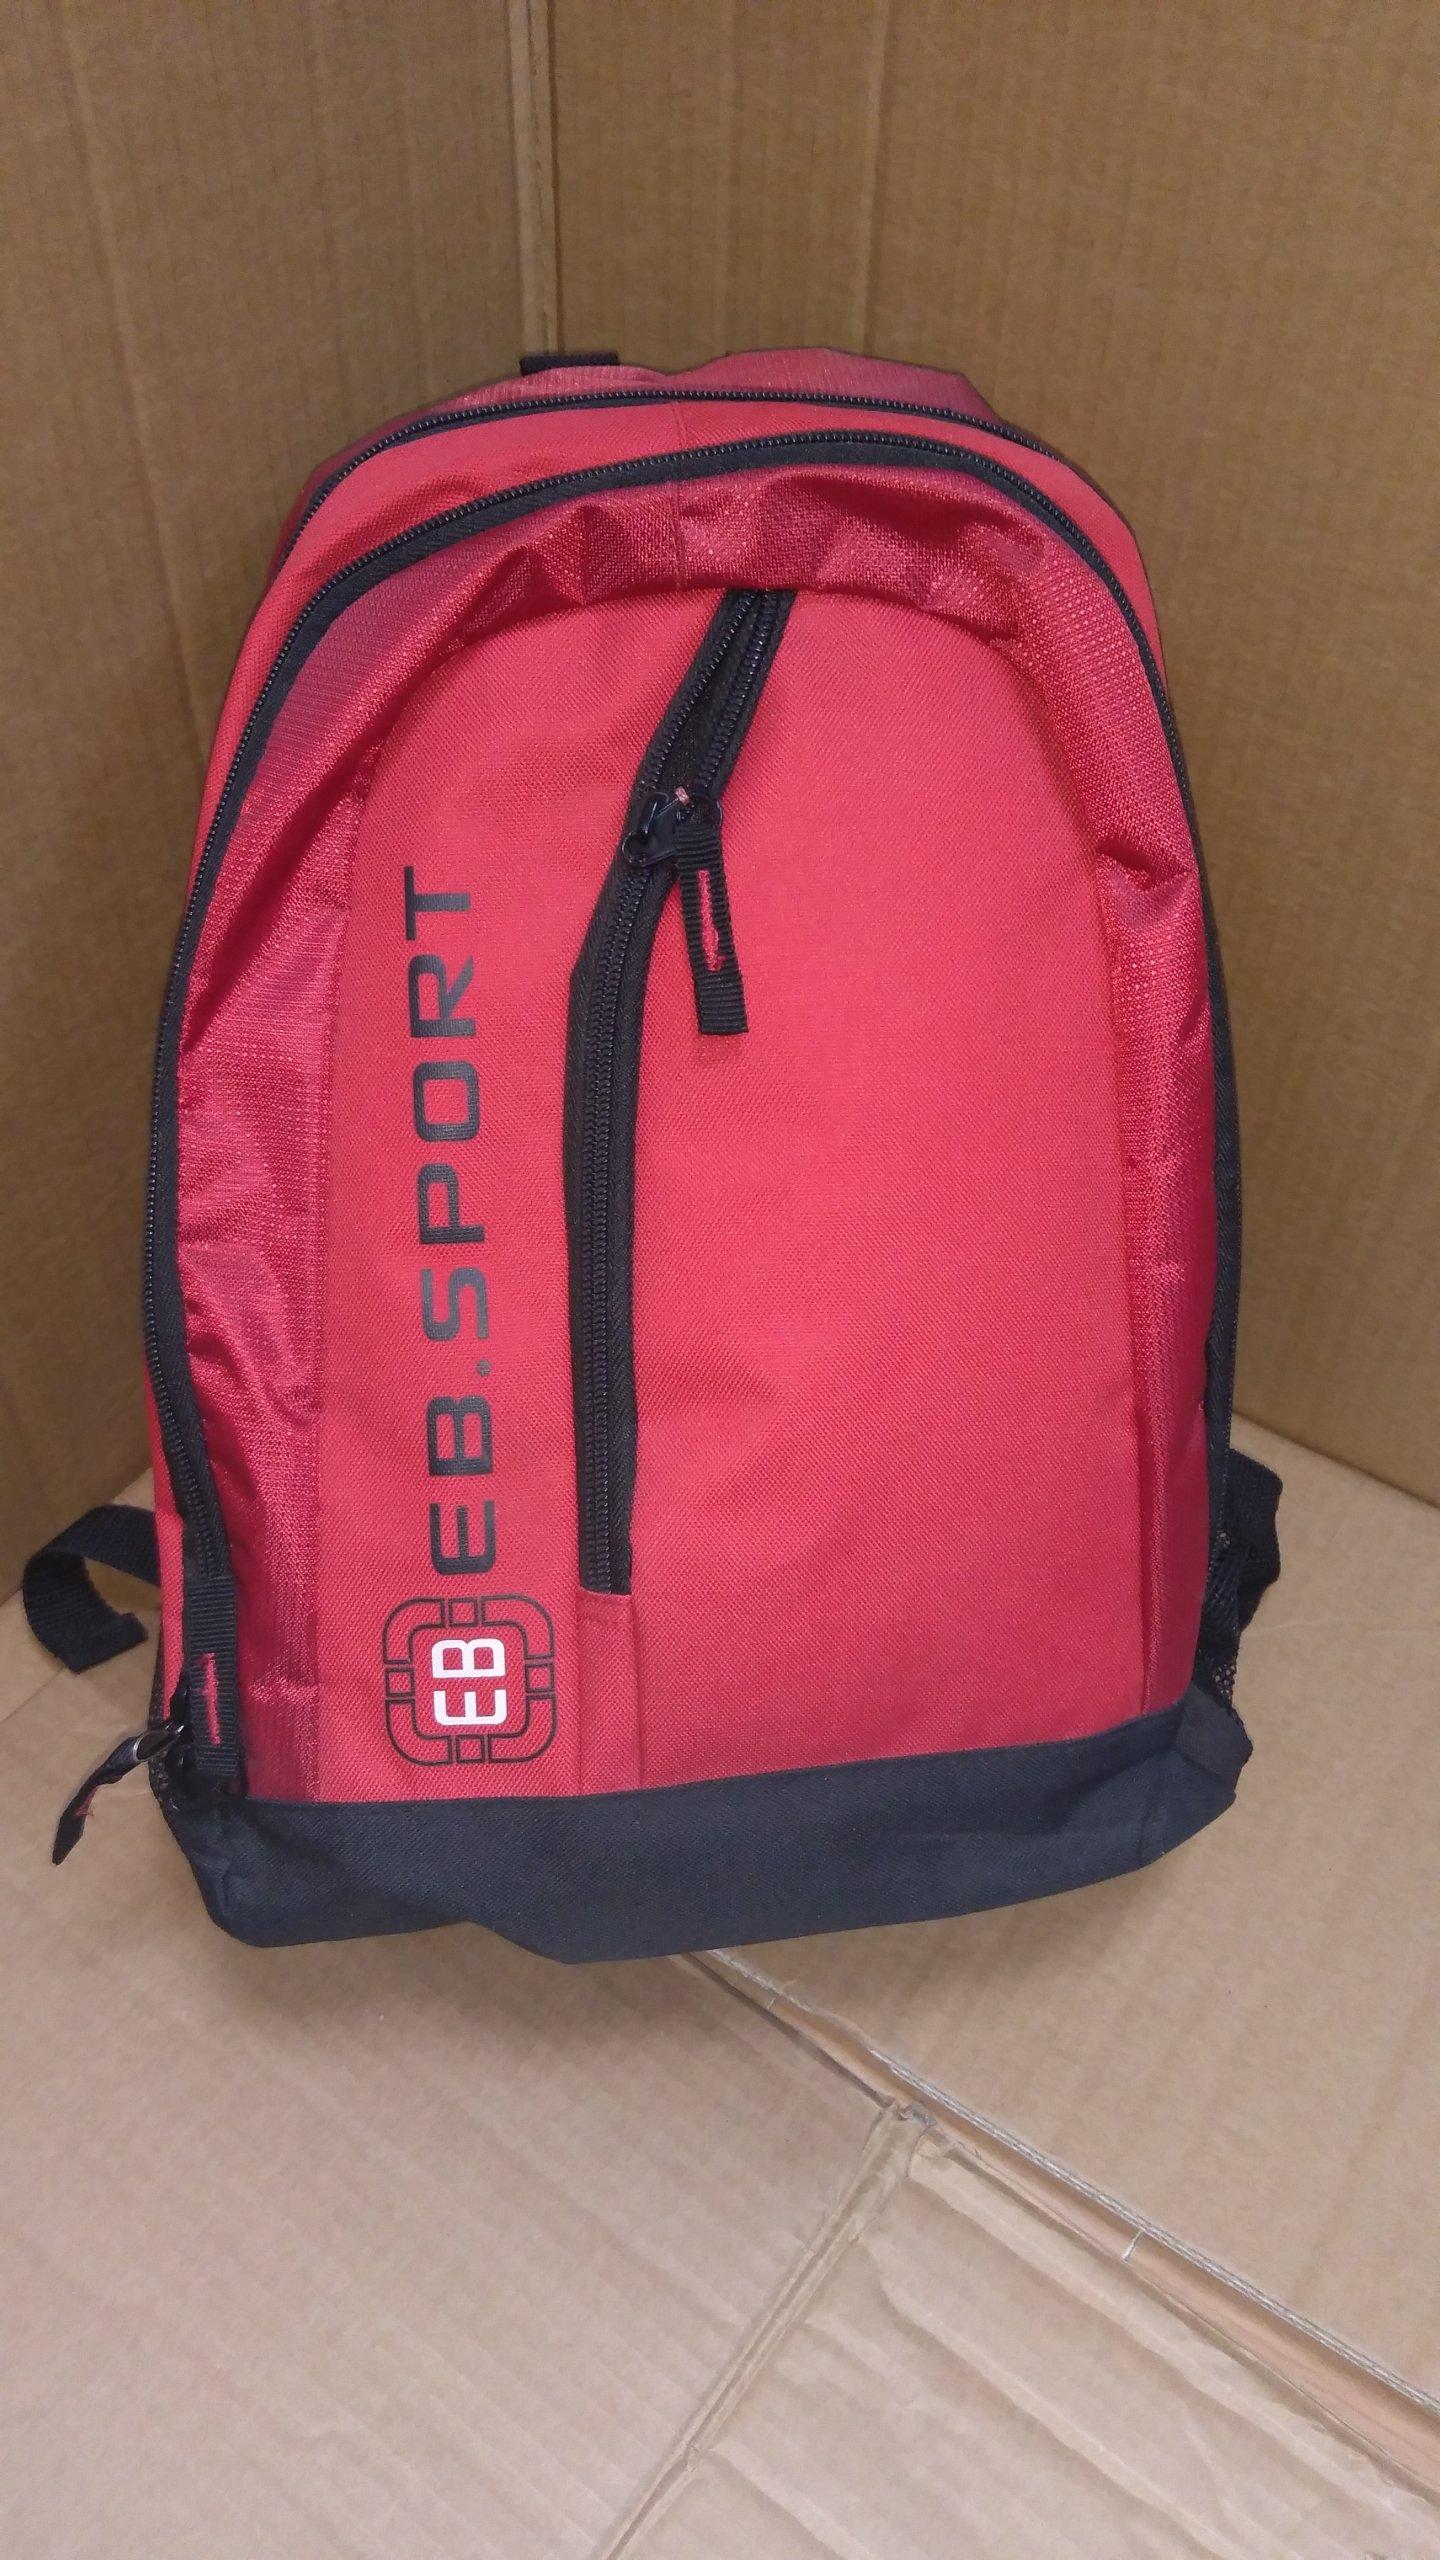 656b9979d7bf5 PLECAK szkolny Enrico Benetti 47040 fluo kolory - 7361095135 ...